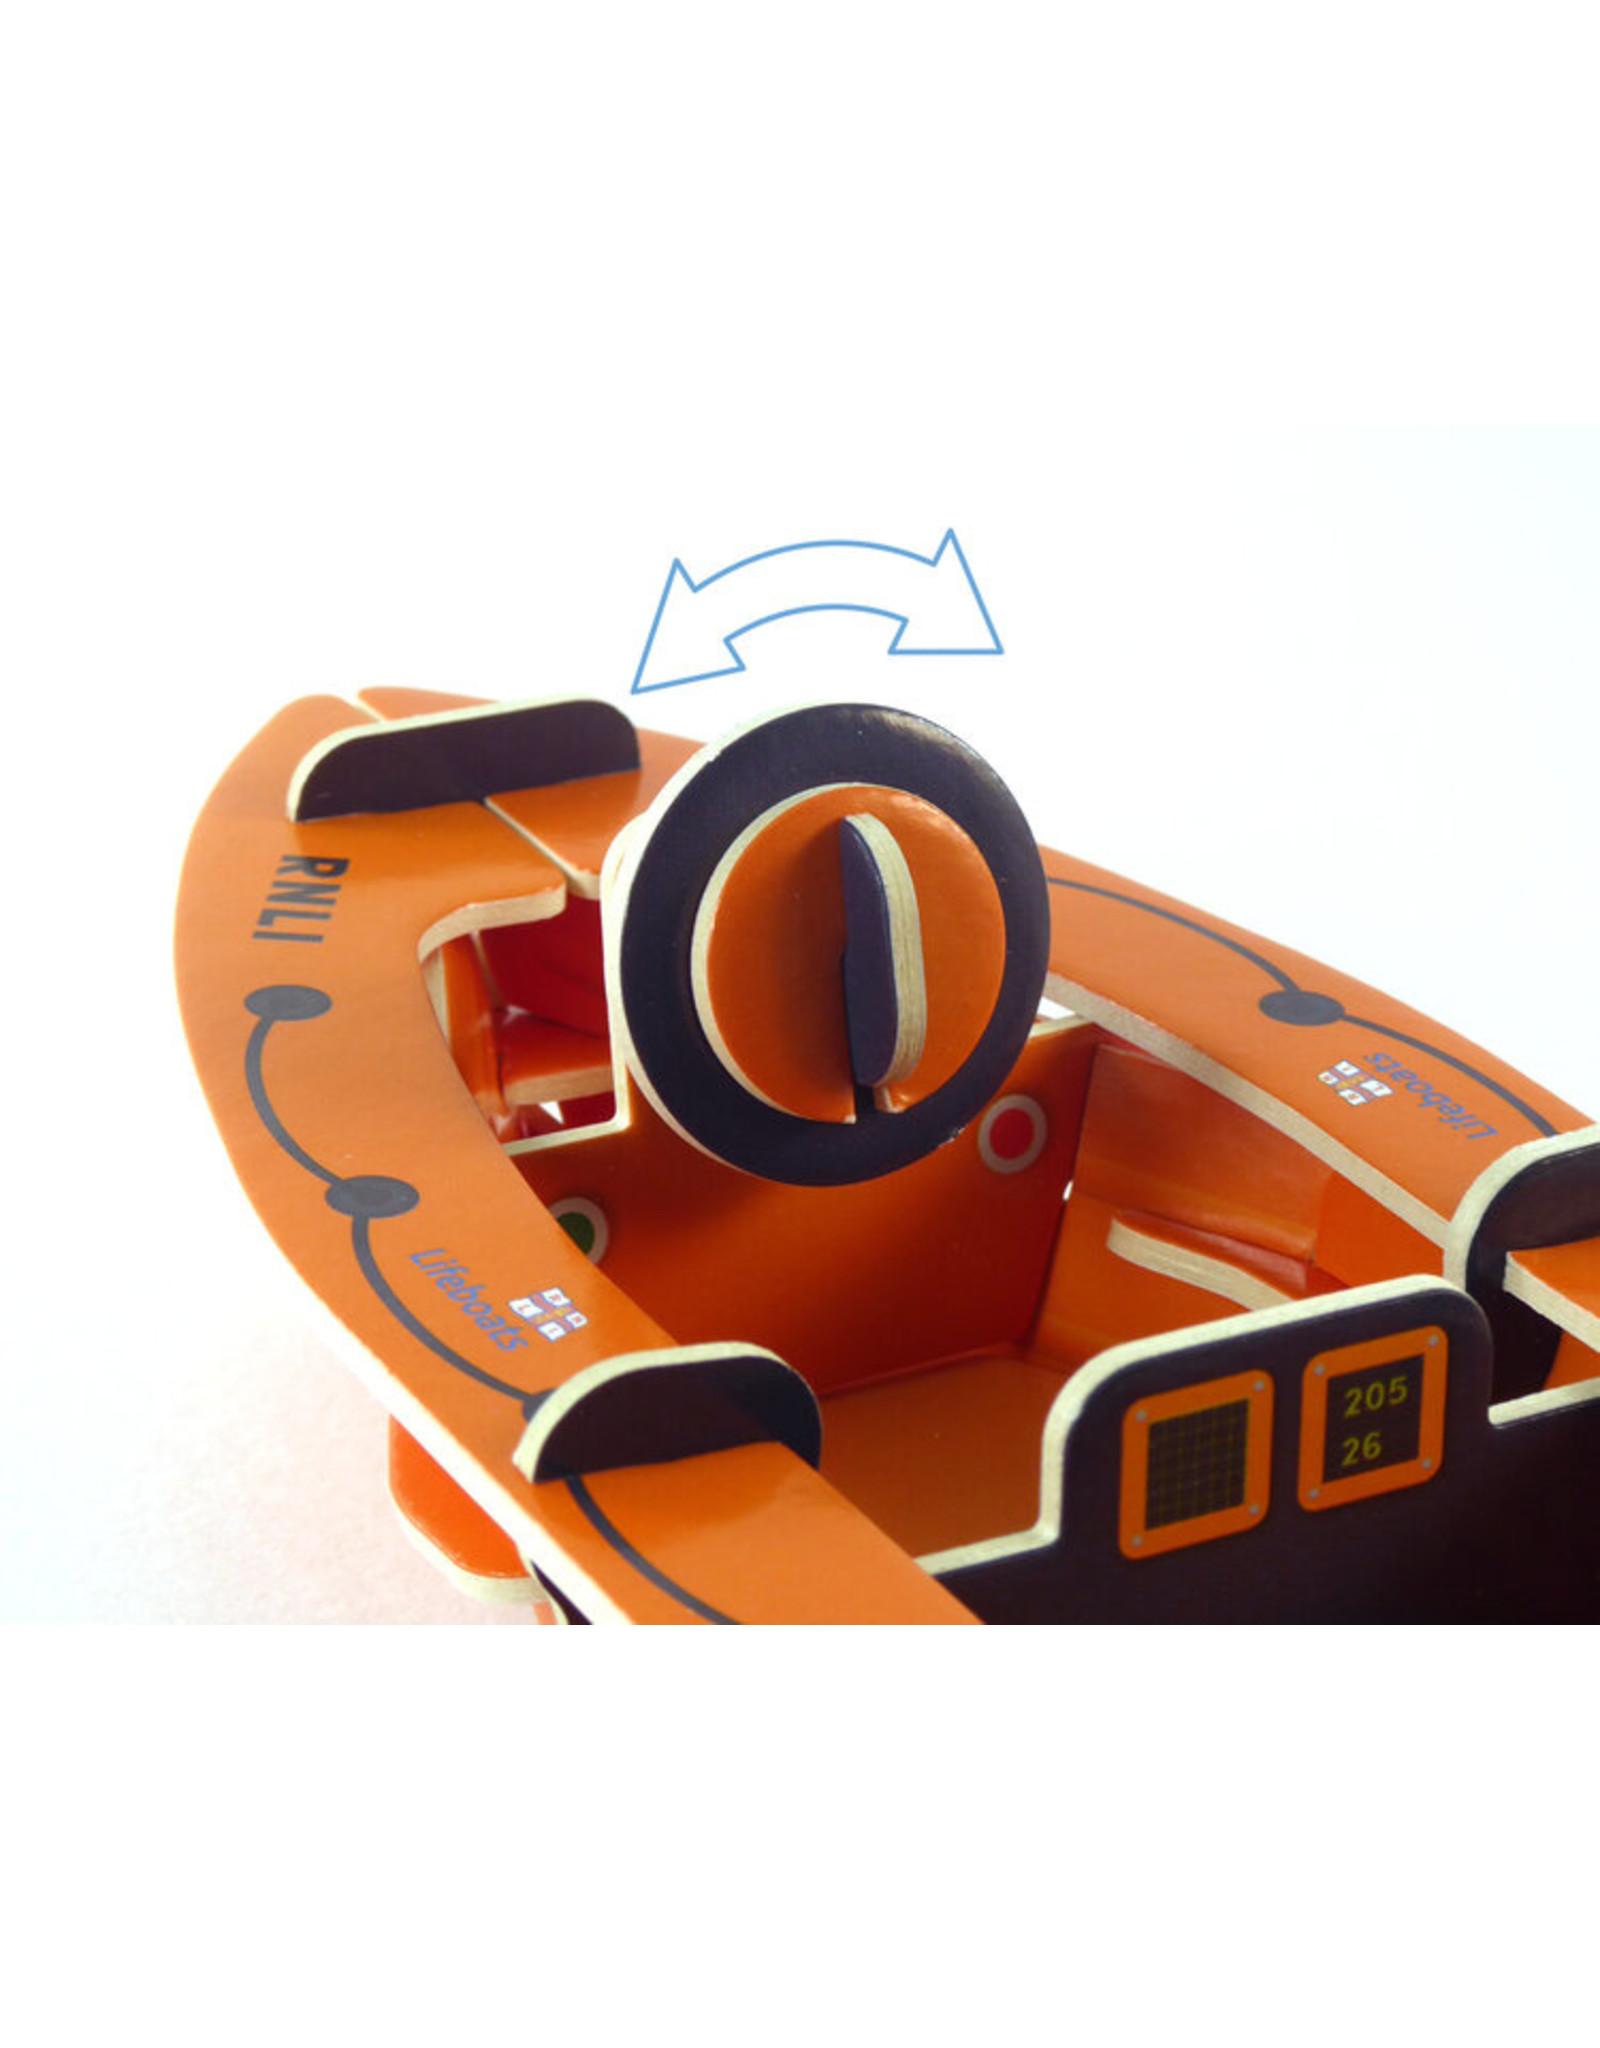 Playpress Toys RNLI Eco Friendly Lifeboat Playset